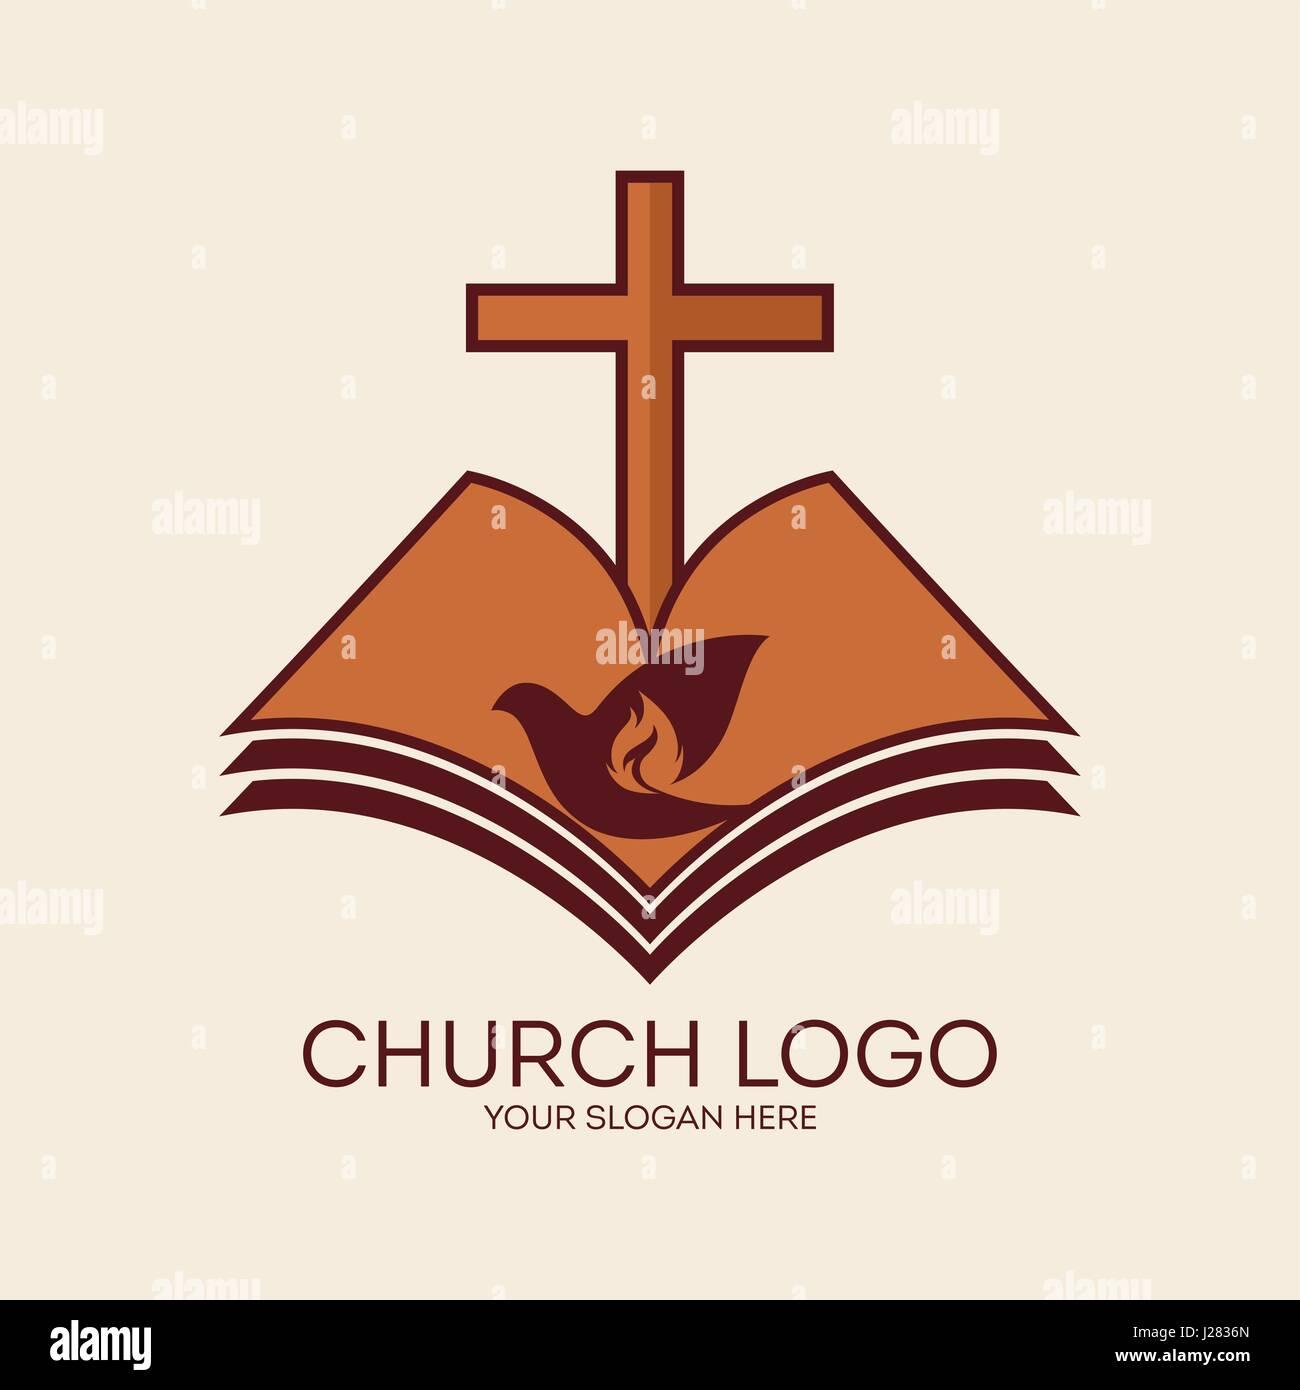 Church logo the cross of jesus the open bible and the dove a church logo the cross of jesus the open bible and the dove a symbol of the spirit of god thecheapjerseys Gallery